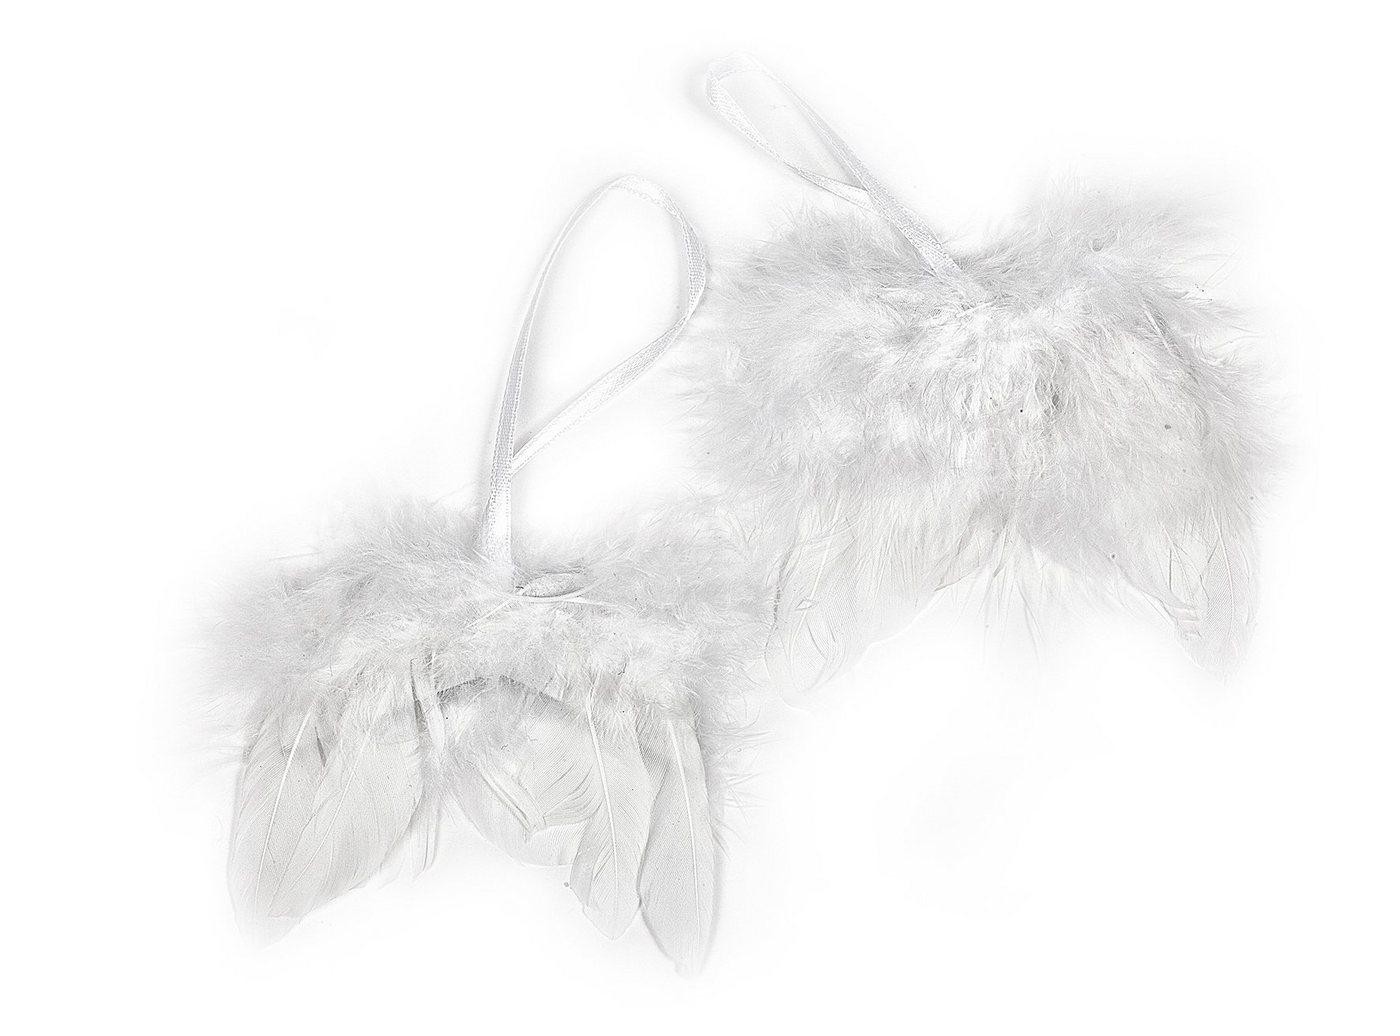 VBS Engelsflügel, weiß, 8cm, 2 Stück | Dekoration > Figuren und Skulpturen > Engel | VBS